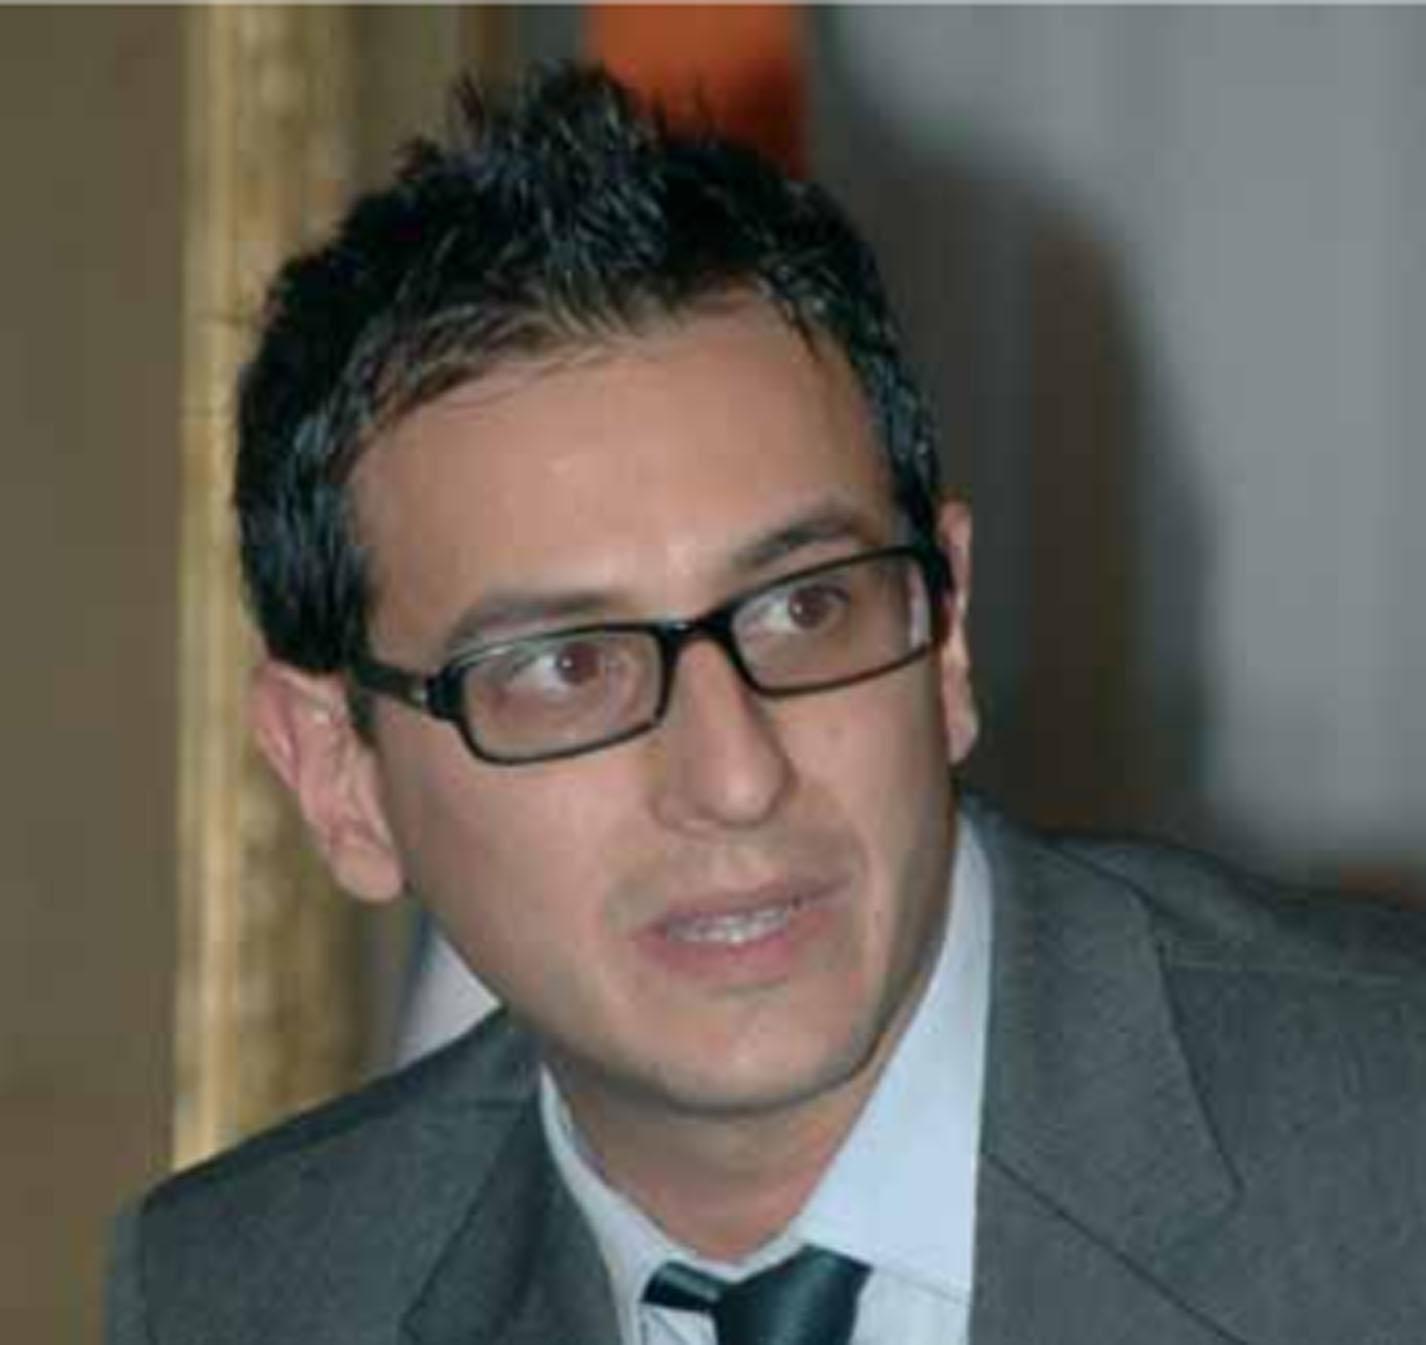 Intervista al Dott. Riccardo Masetti